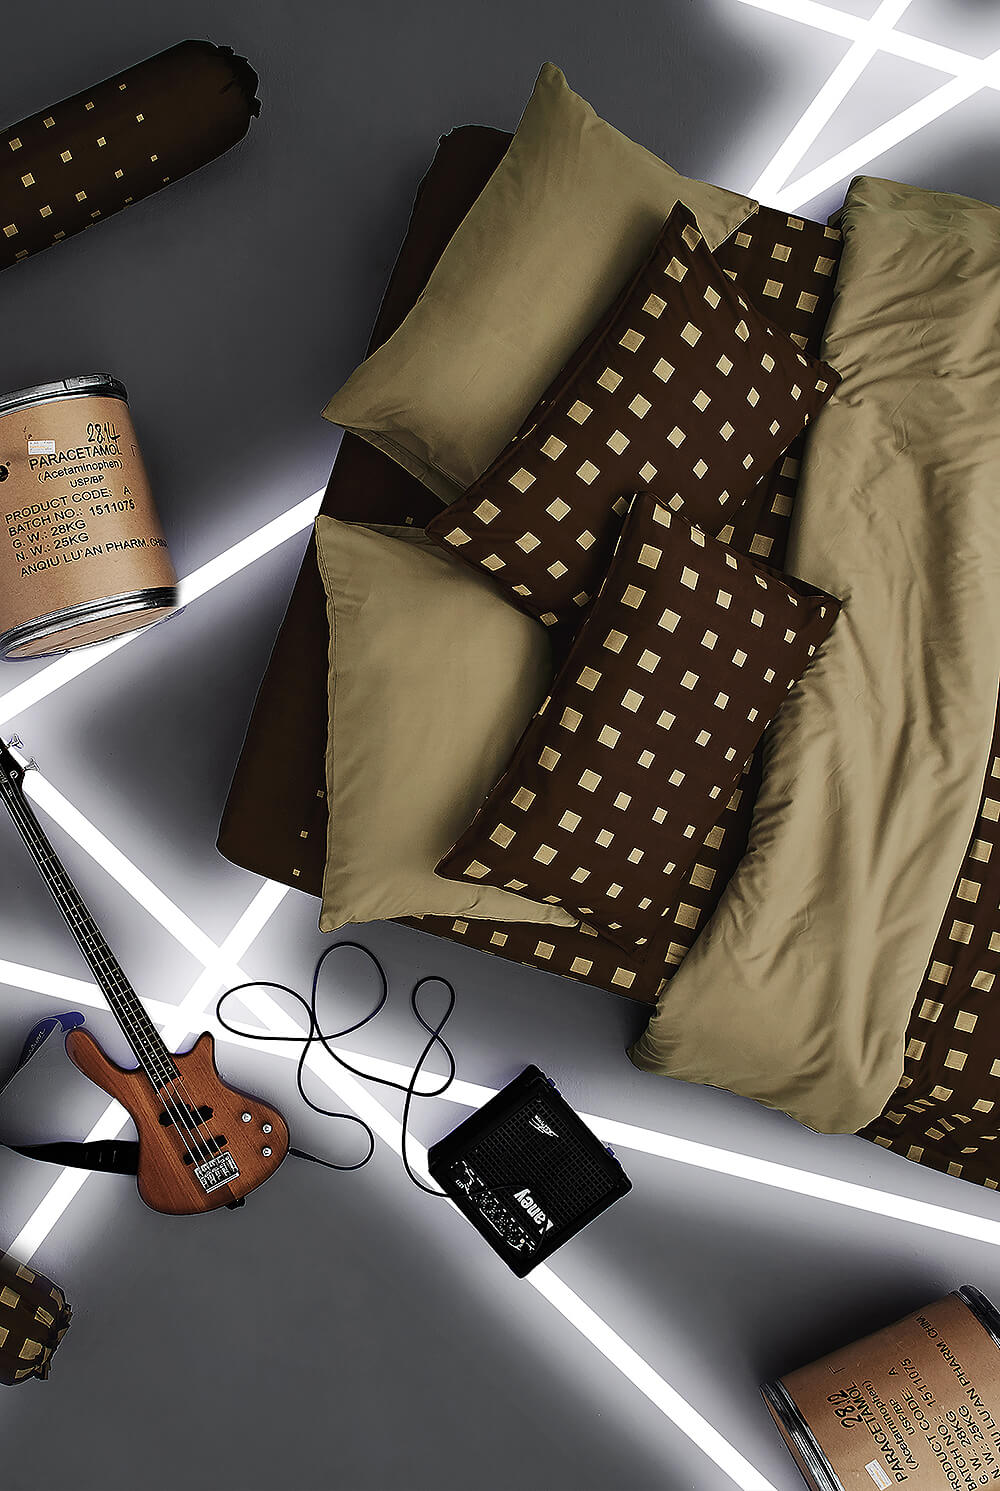 Dunlopillo รุ่น Stella ชุดผ้าปูที่นอน DL-LATTE-S